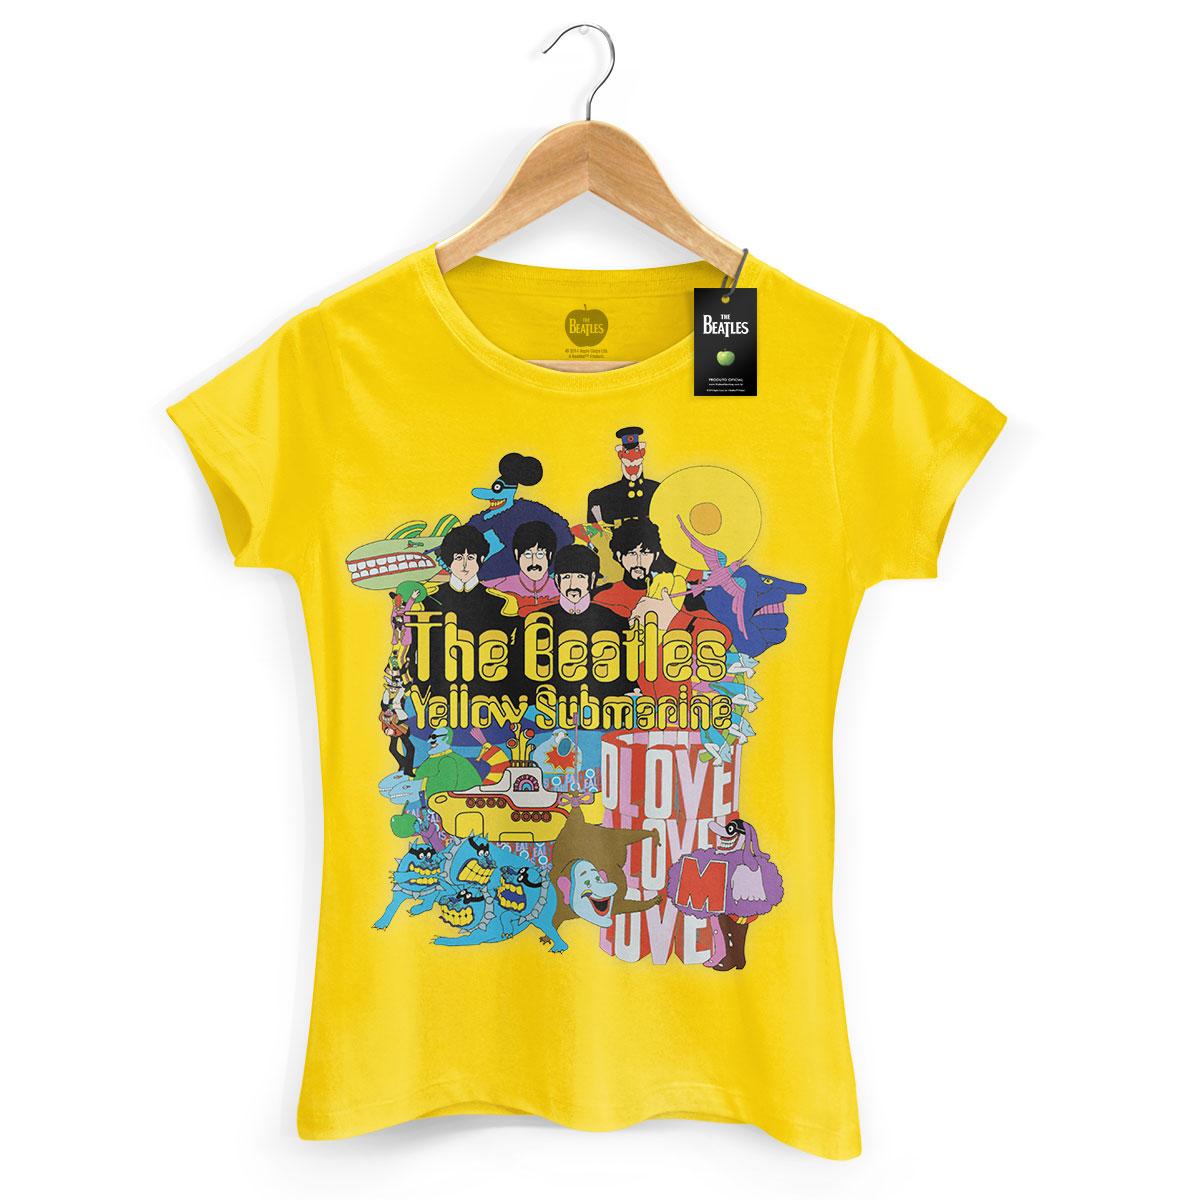 8e04e6209ec Camiseta Feminina The Beatles Yellow Submarine - The Beatles Shop